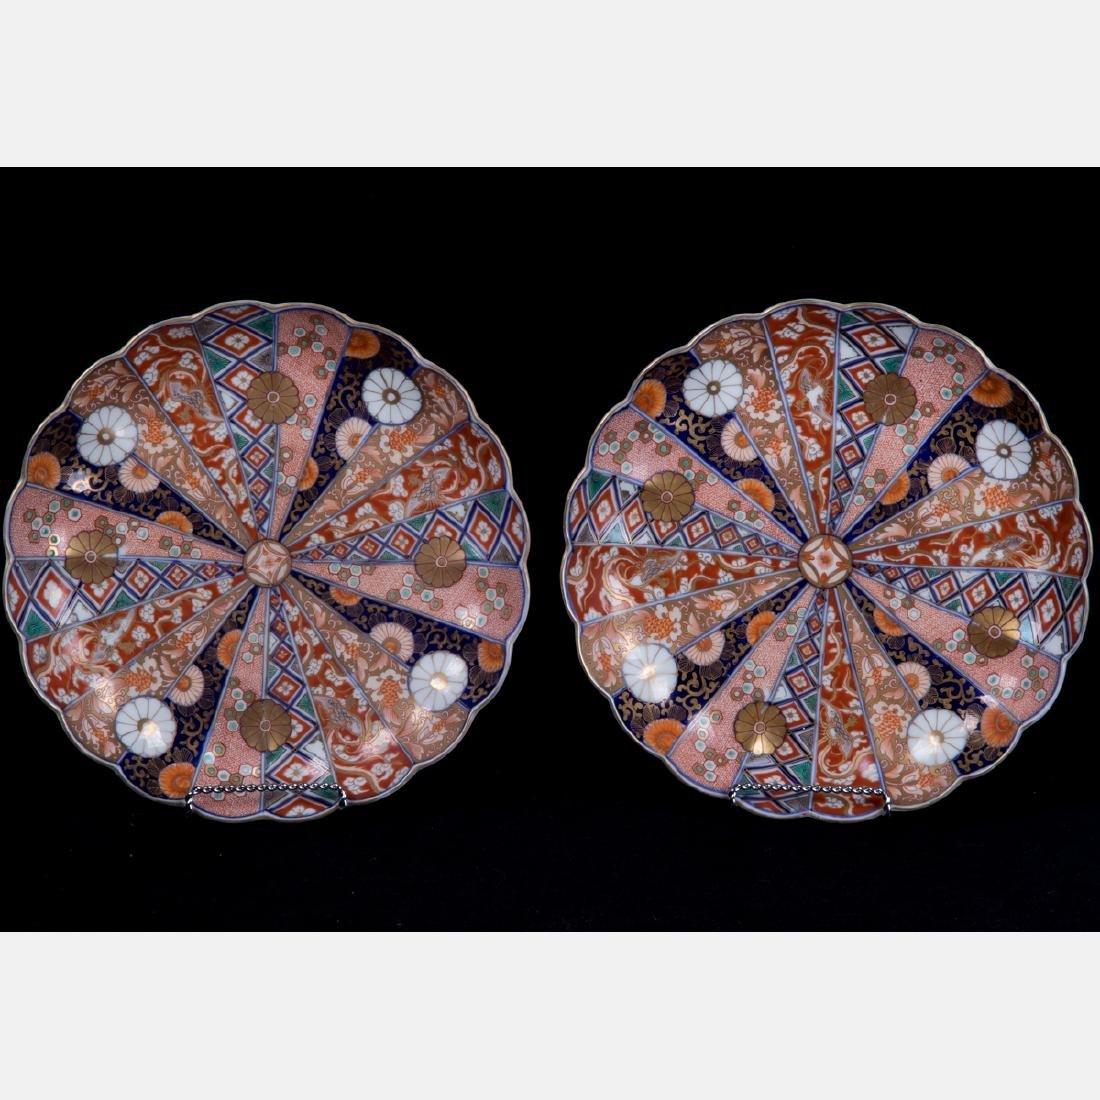 A Pair of Japanese Imari Porcelain Plates, Meiji